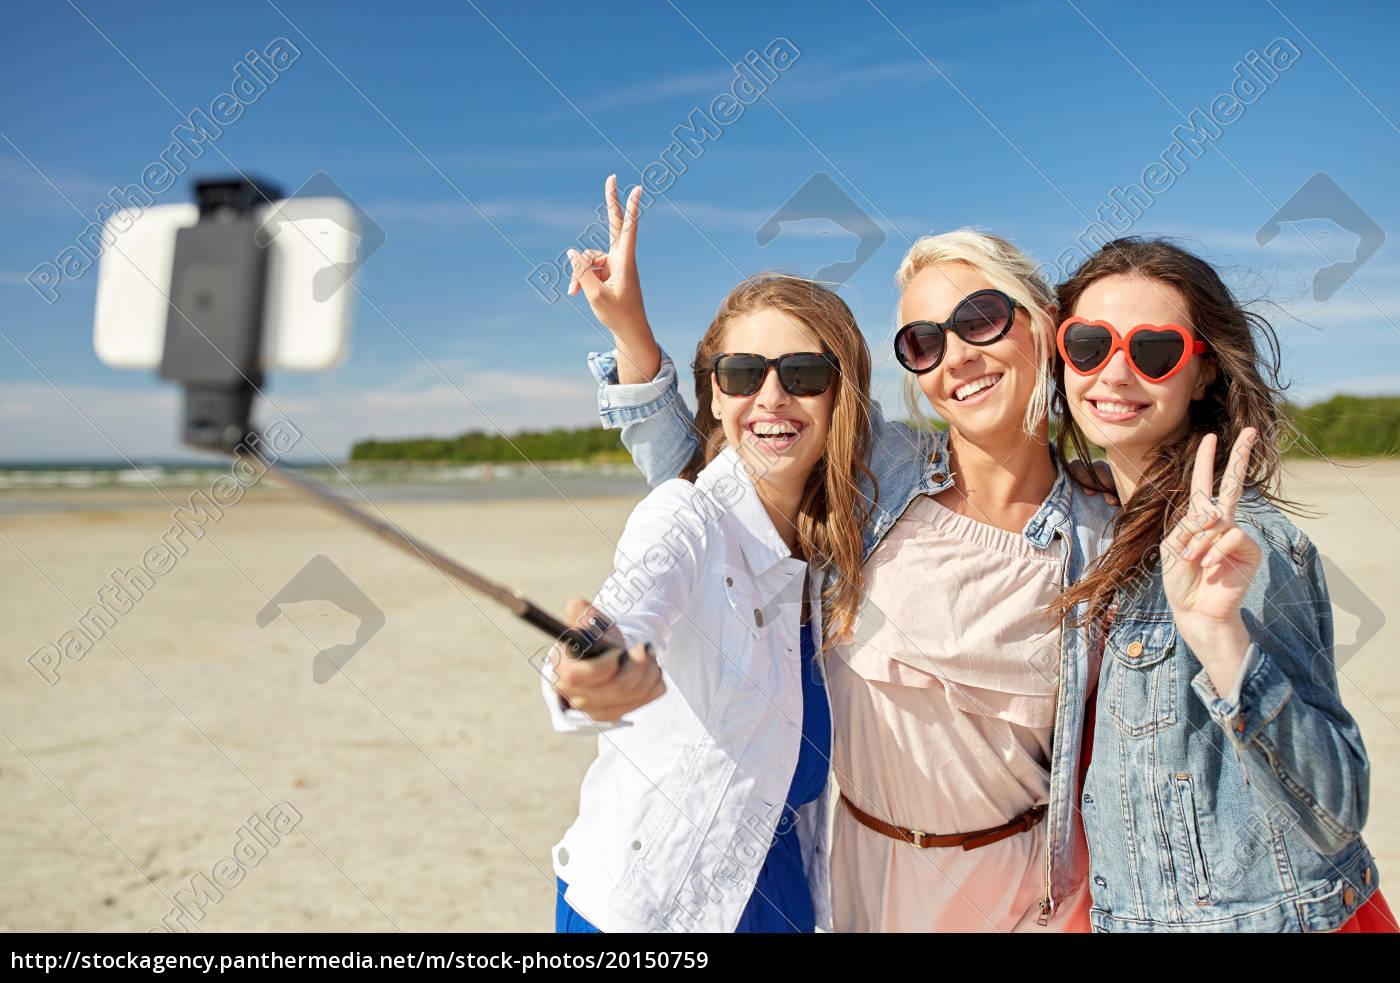 group, of, smiling, women, taking, selfie - 20150759